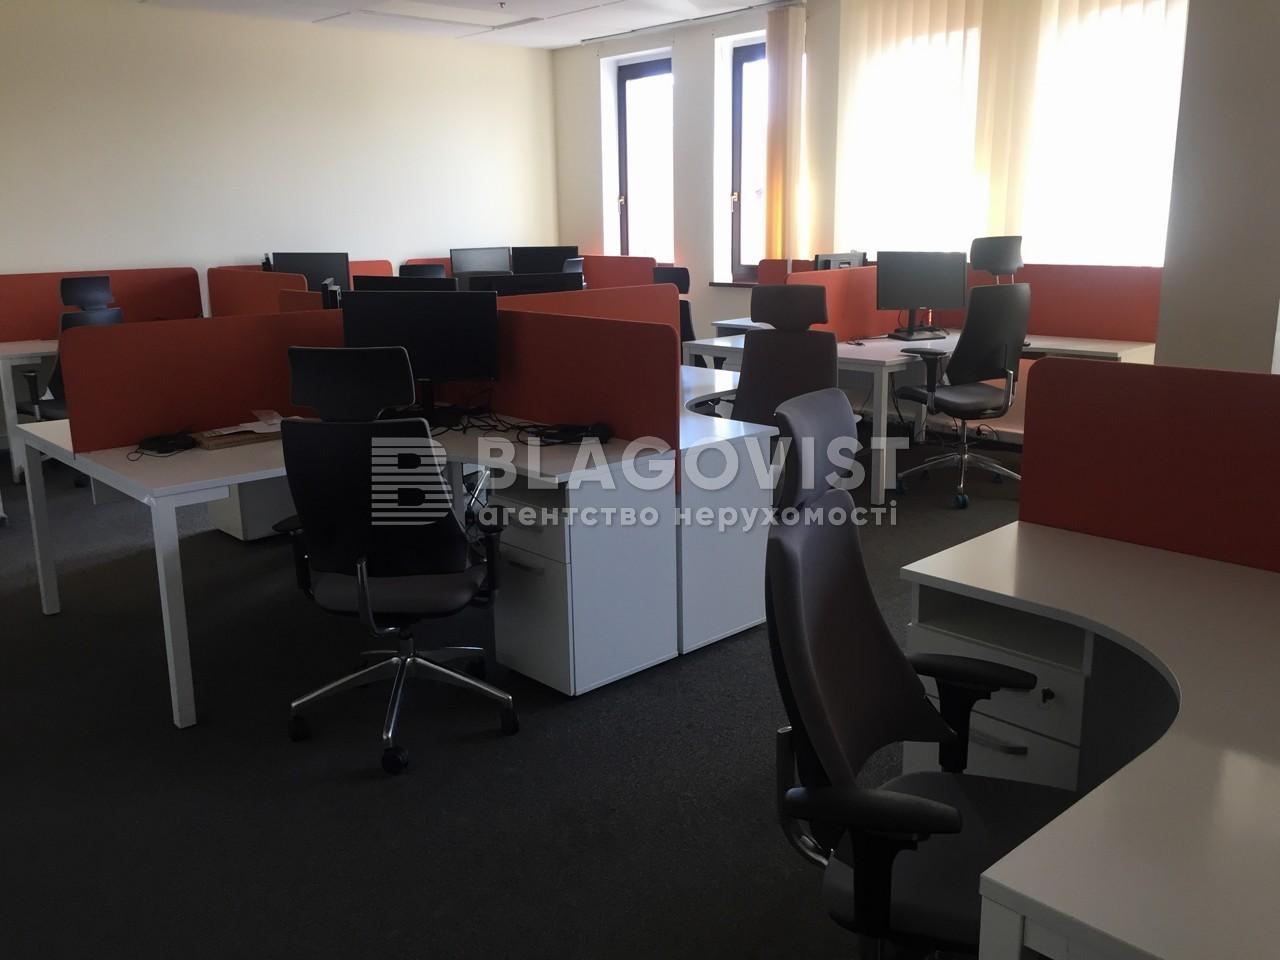 Бизнес-центр, Дегтяревская, Киев, E-39898 - Фото 8